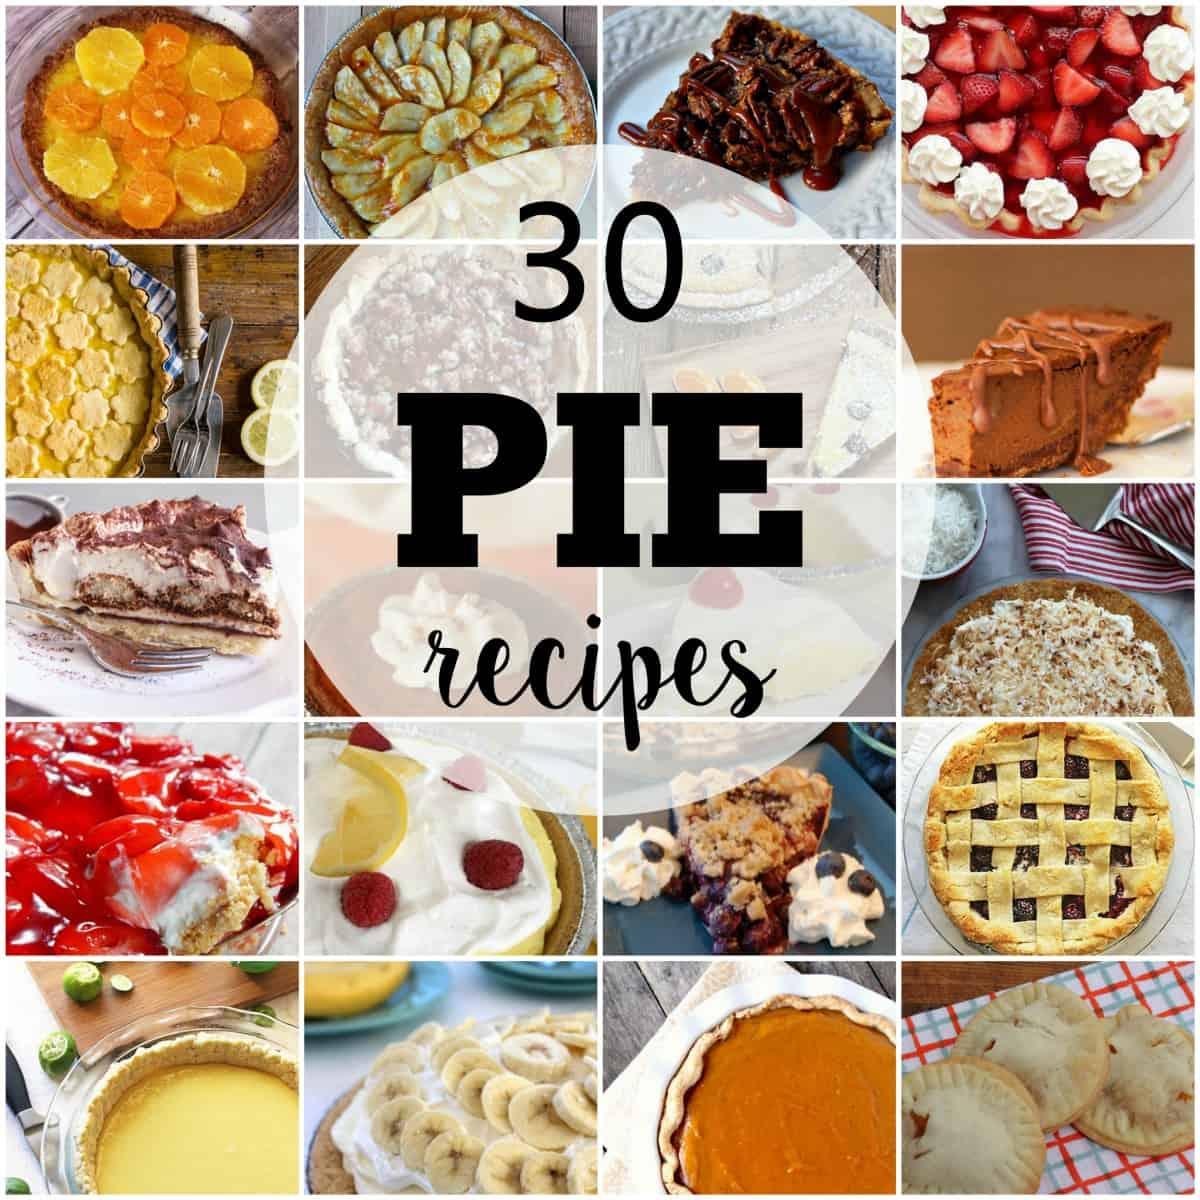 30 Pie Recipes - Delicious Desserts